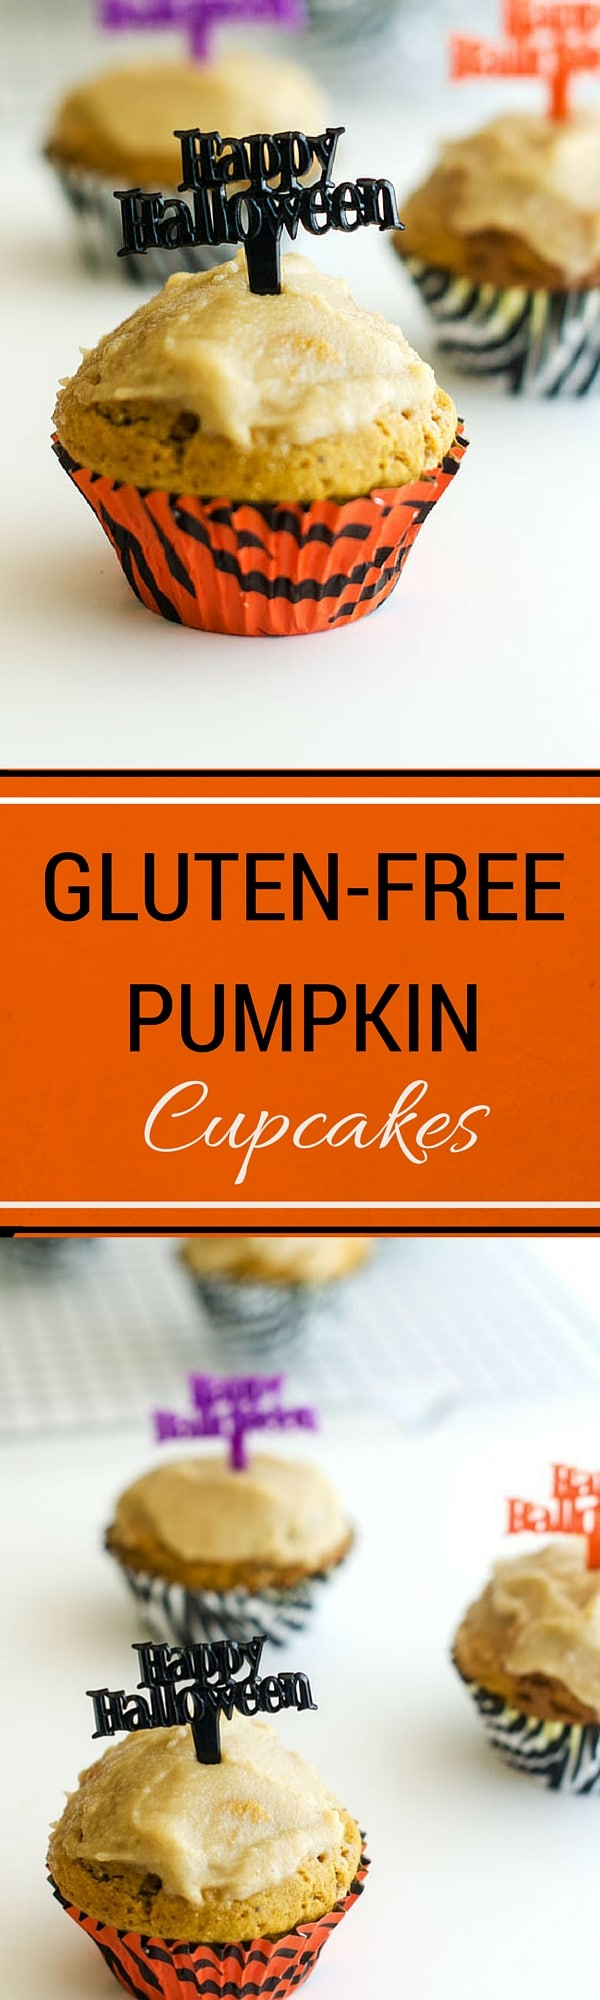 Gluten Free Pumpkin Quinoa Cupcakes - Wendy Polisi